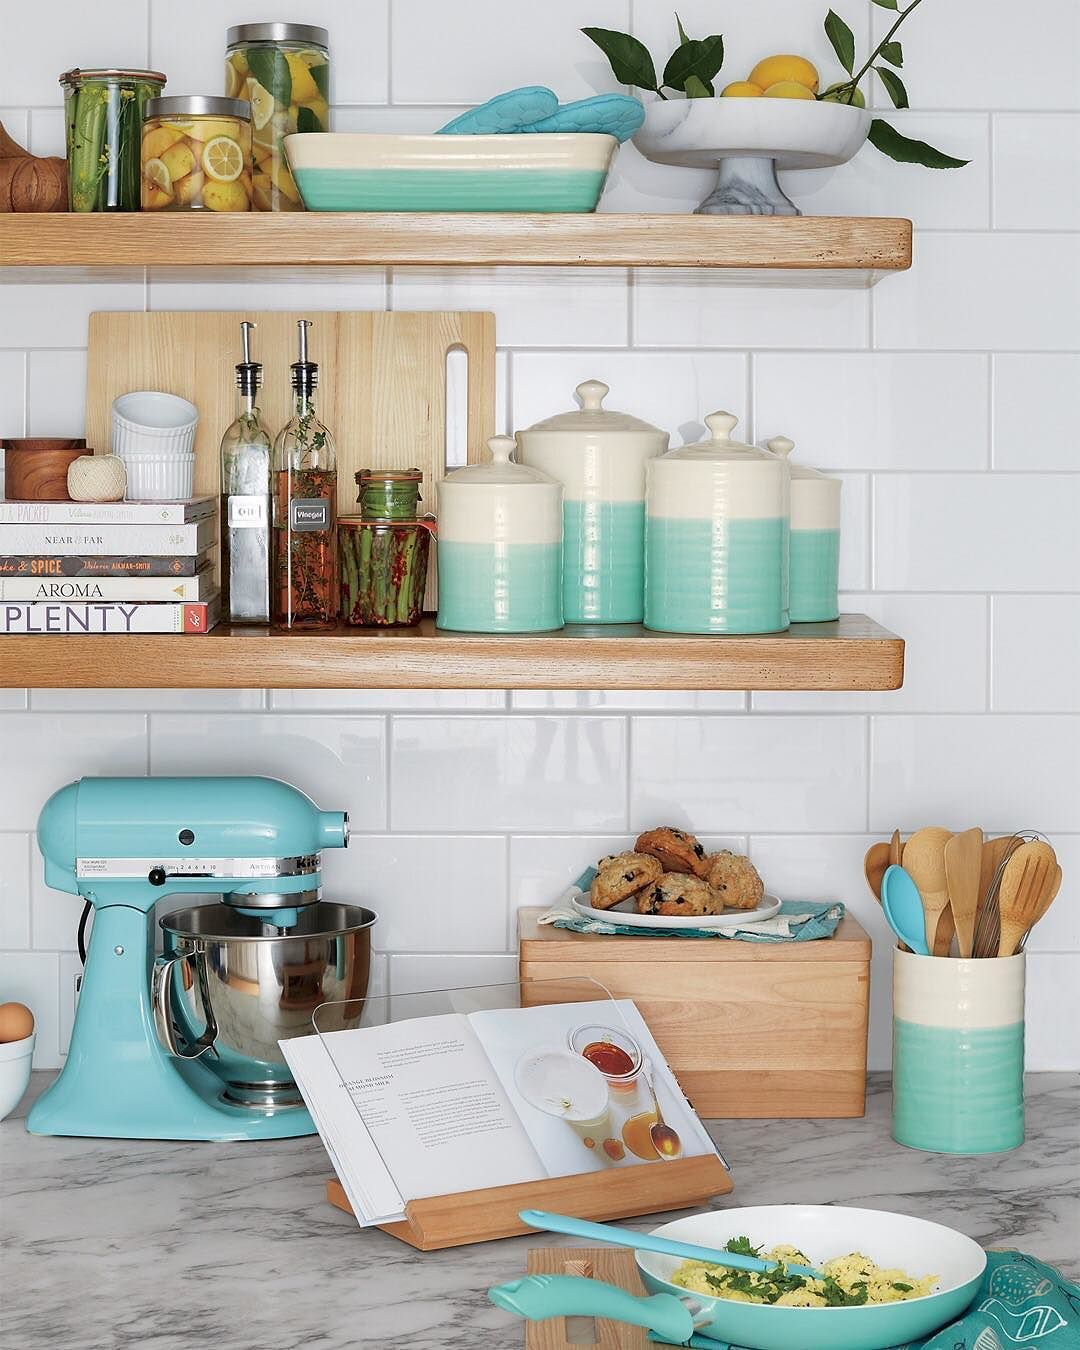 dash kitchen appliances design app a of aqua plus pinch cream shoplinkinbio